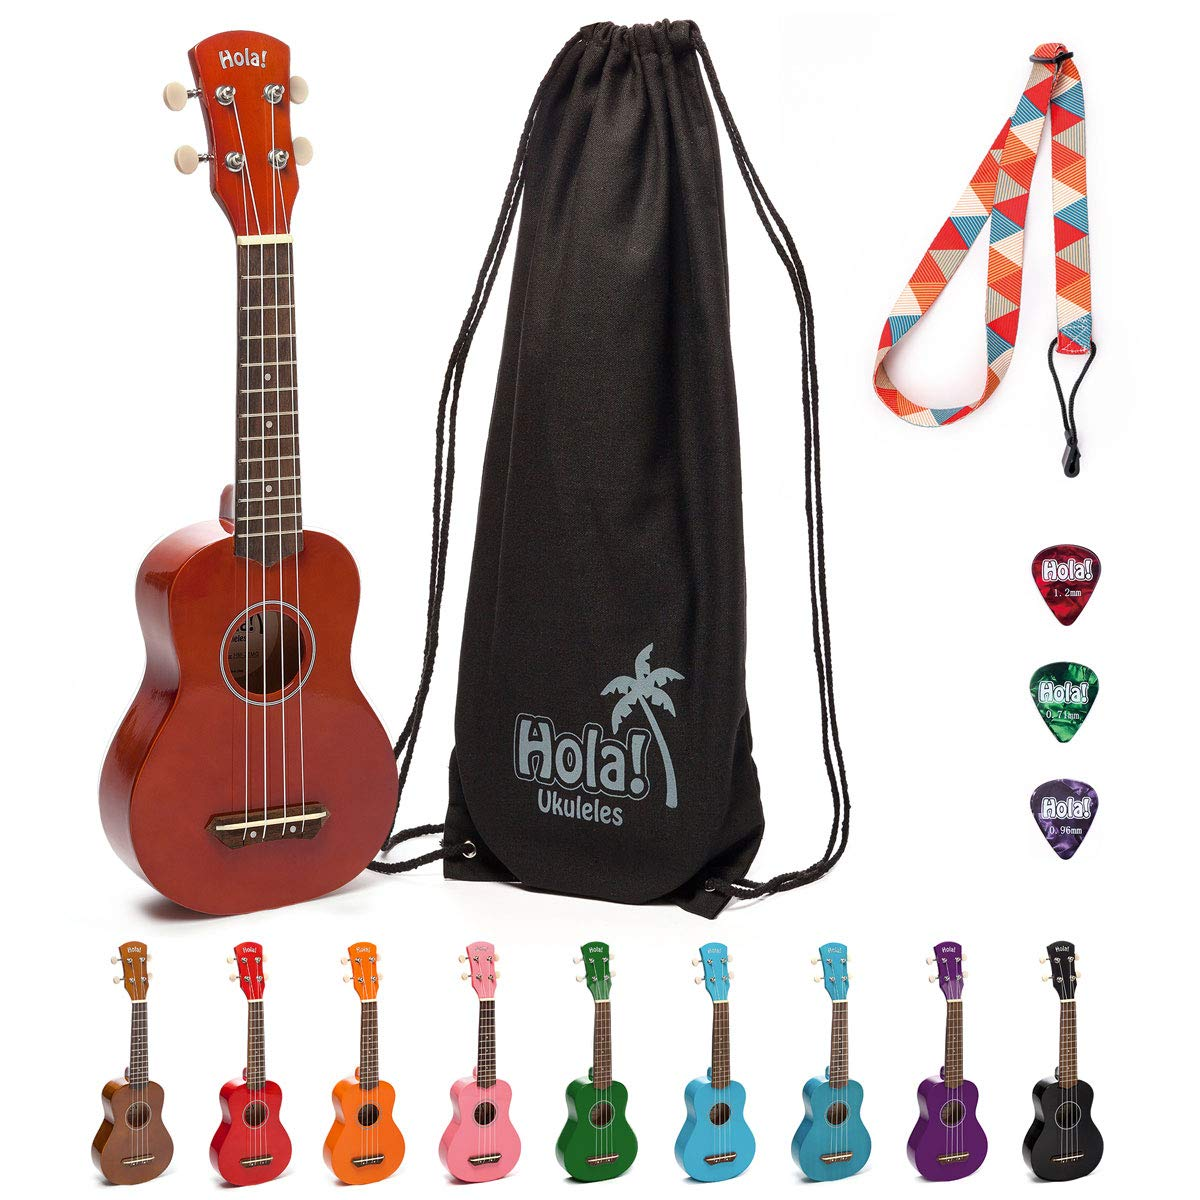 Hola! Music HM-21MG Soprano Ukulele Bundle with Canvas Tote Bag, Strap and Picks, Color Series - Mahogany by Hola! Music